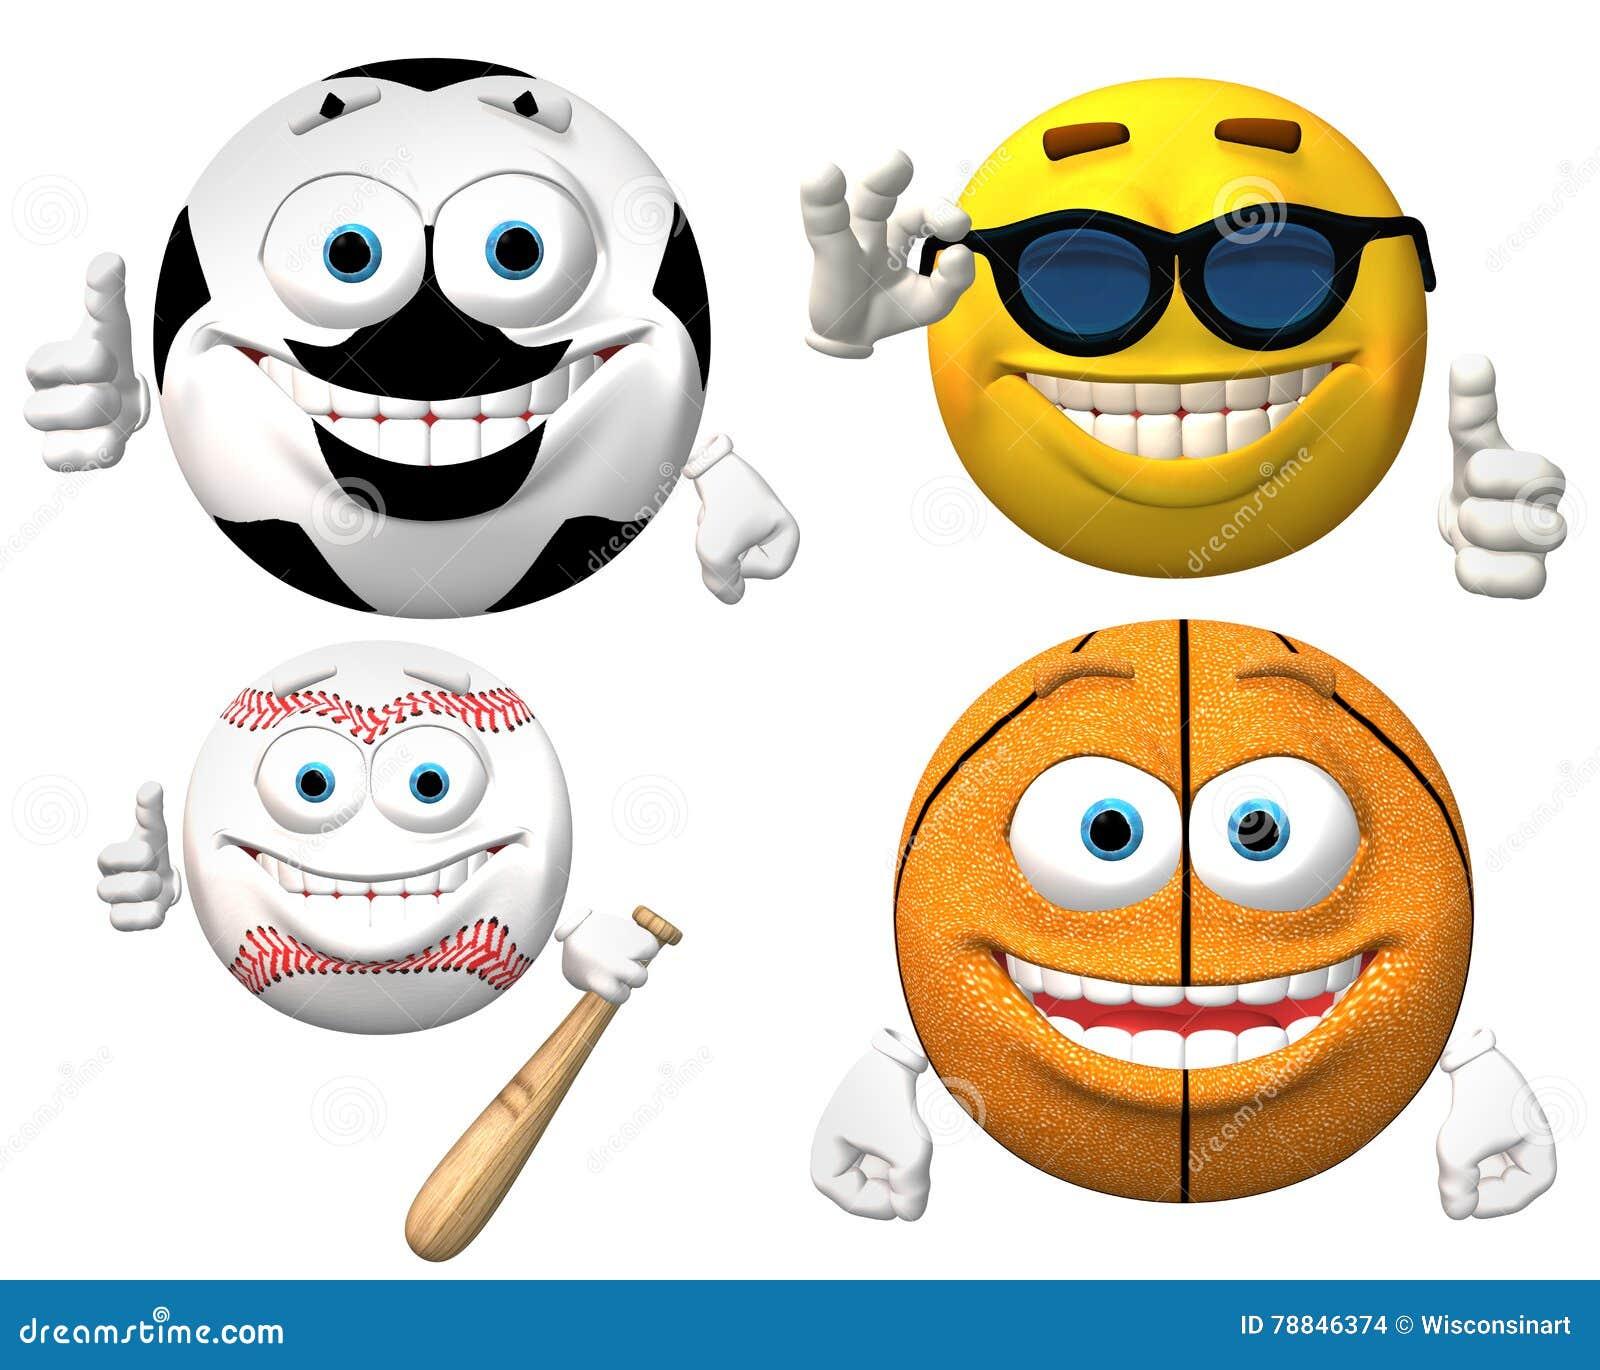 Sport Smiley Faces Isolated Stockfoto Illustration Von